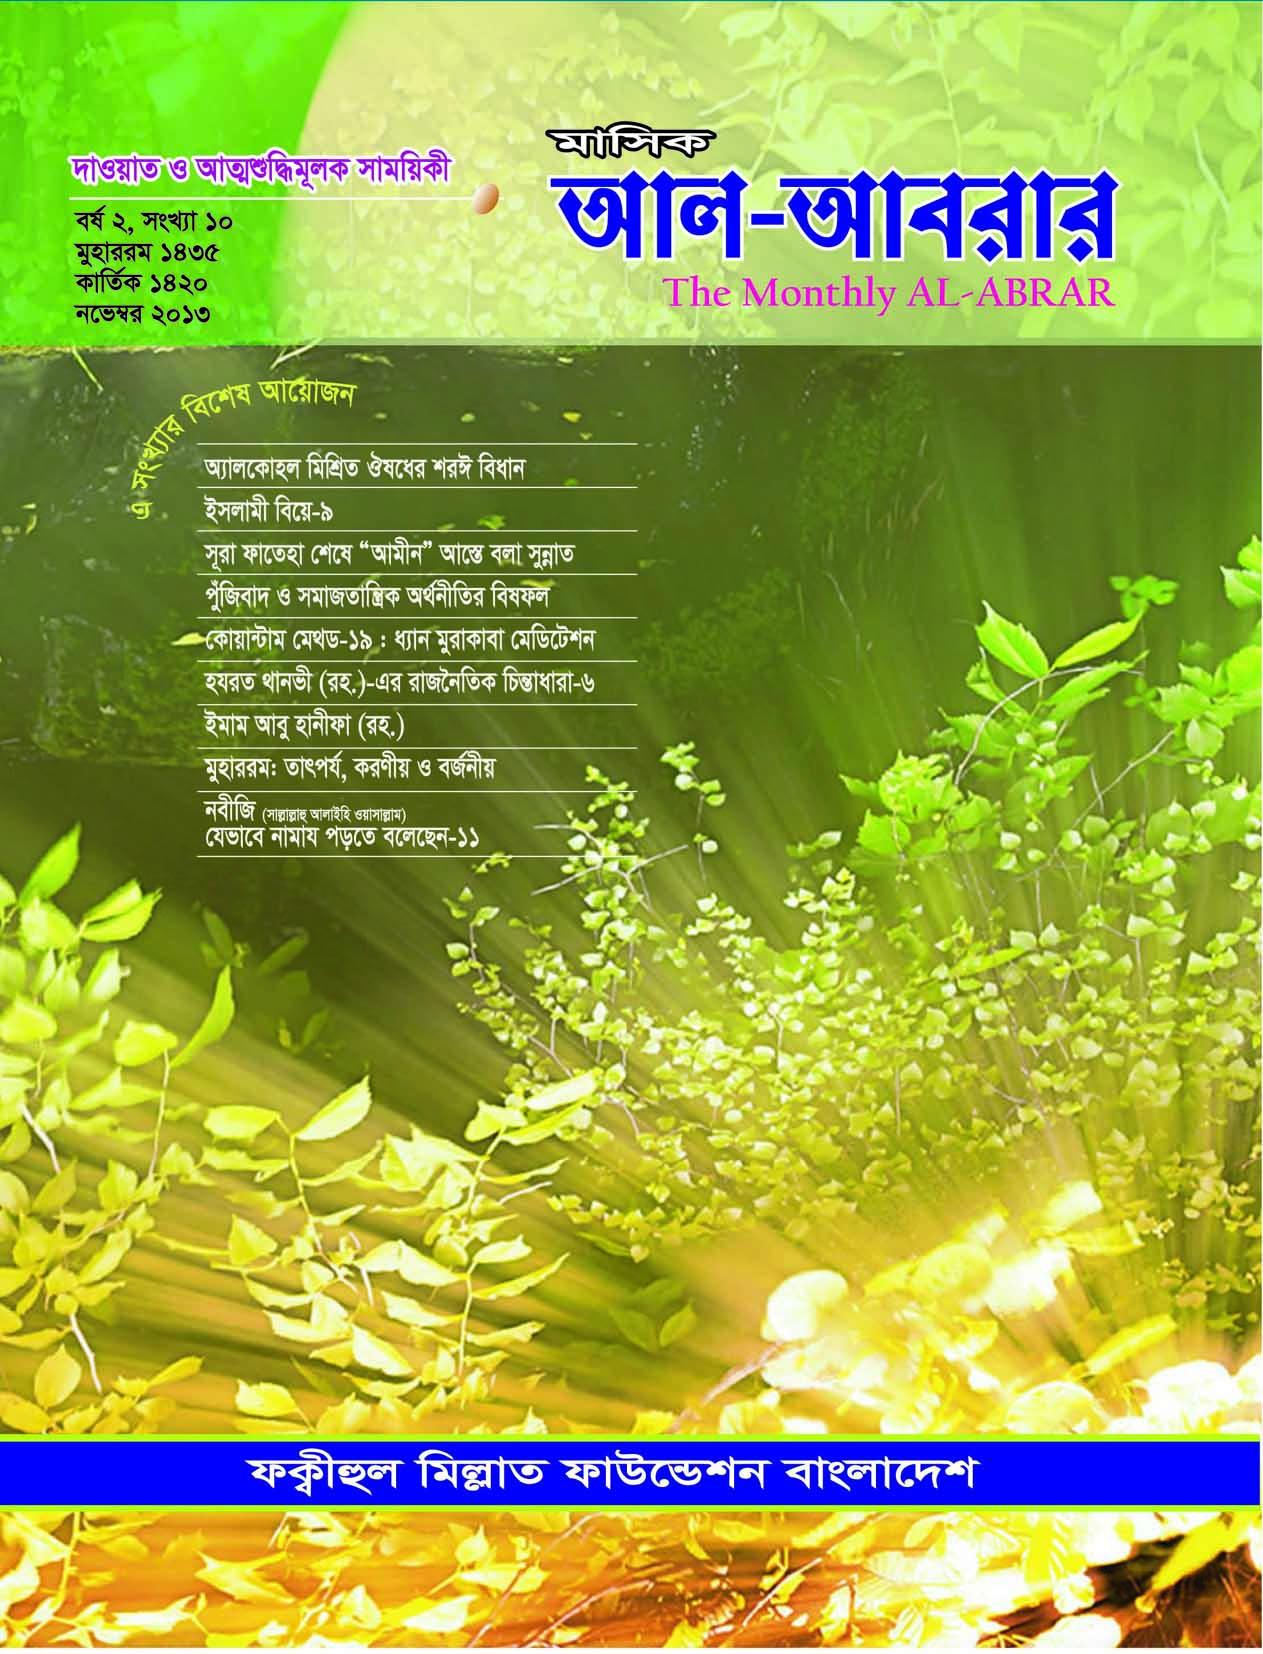 Cover Finel 11-2013-Fainal copy